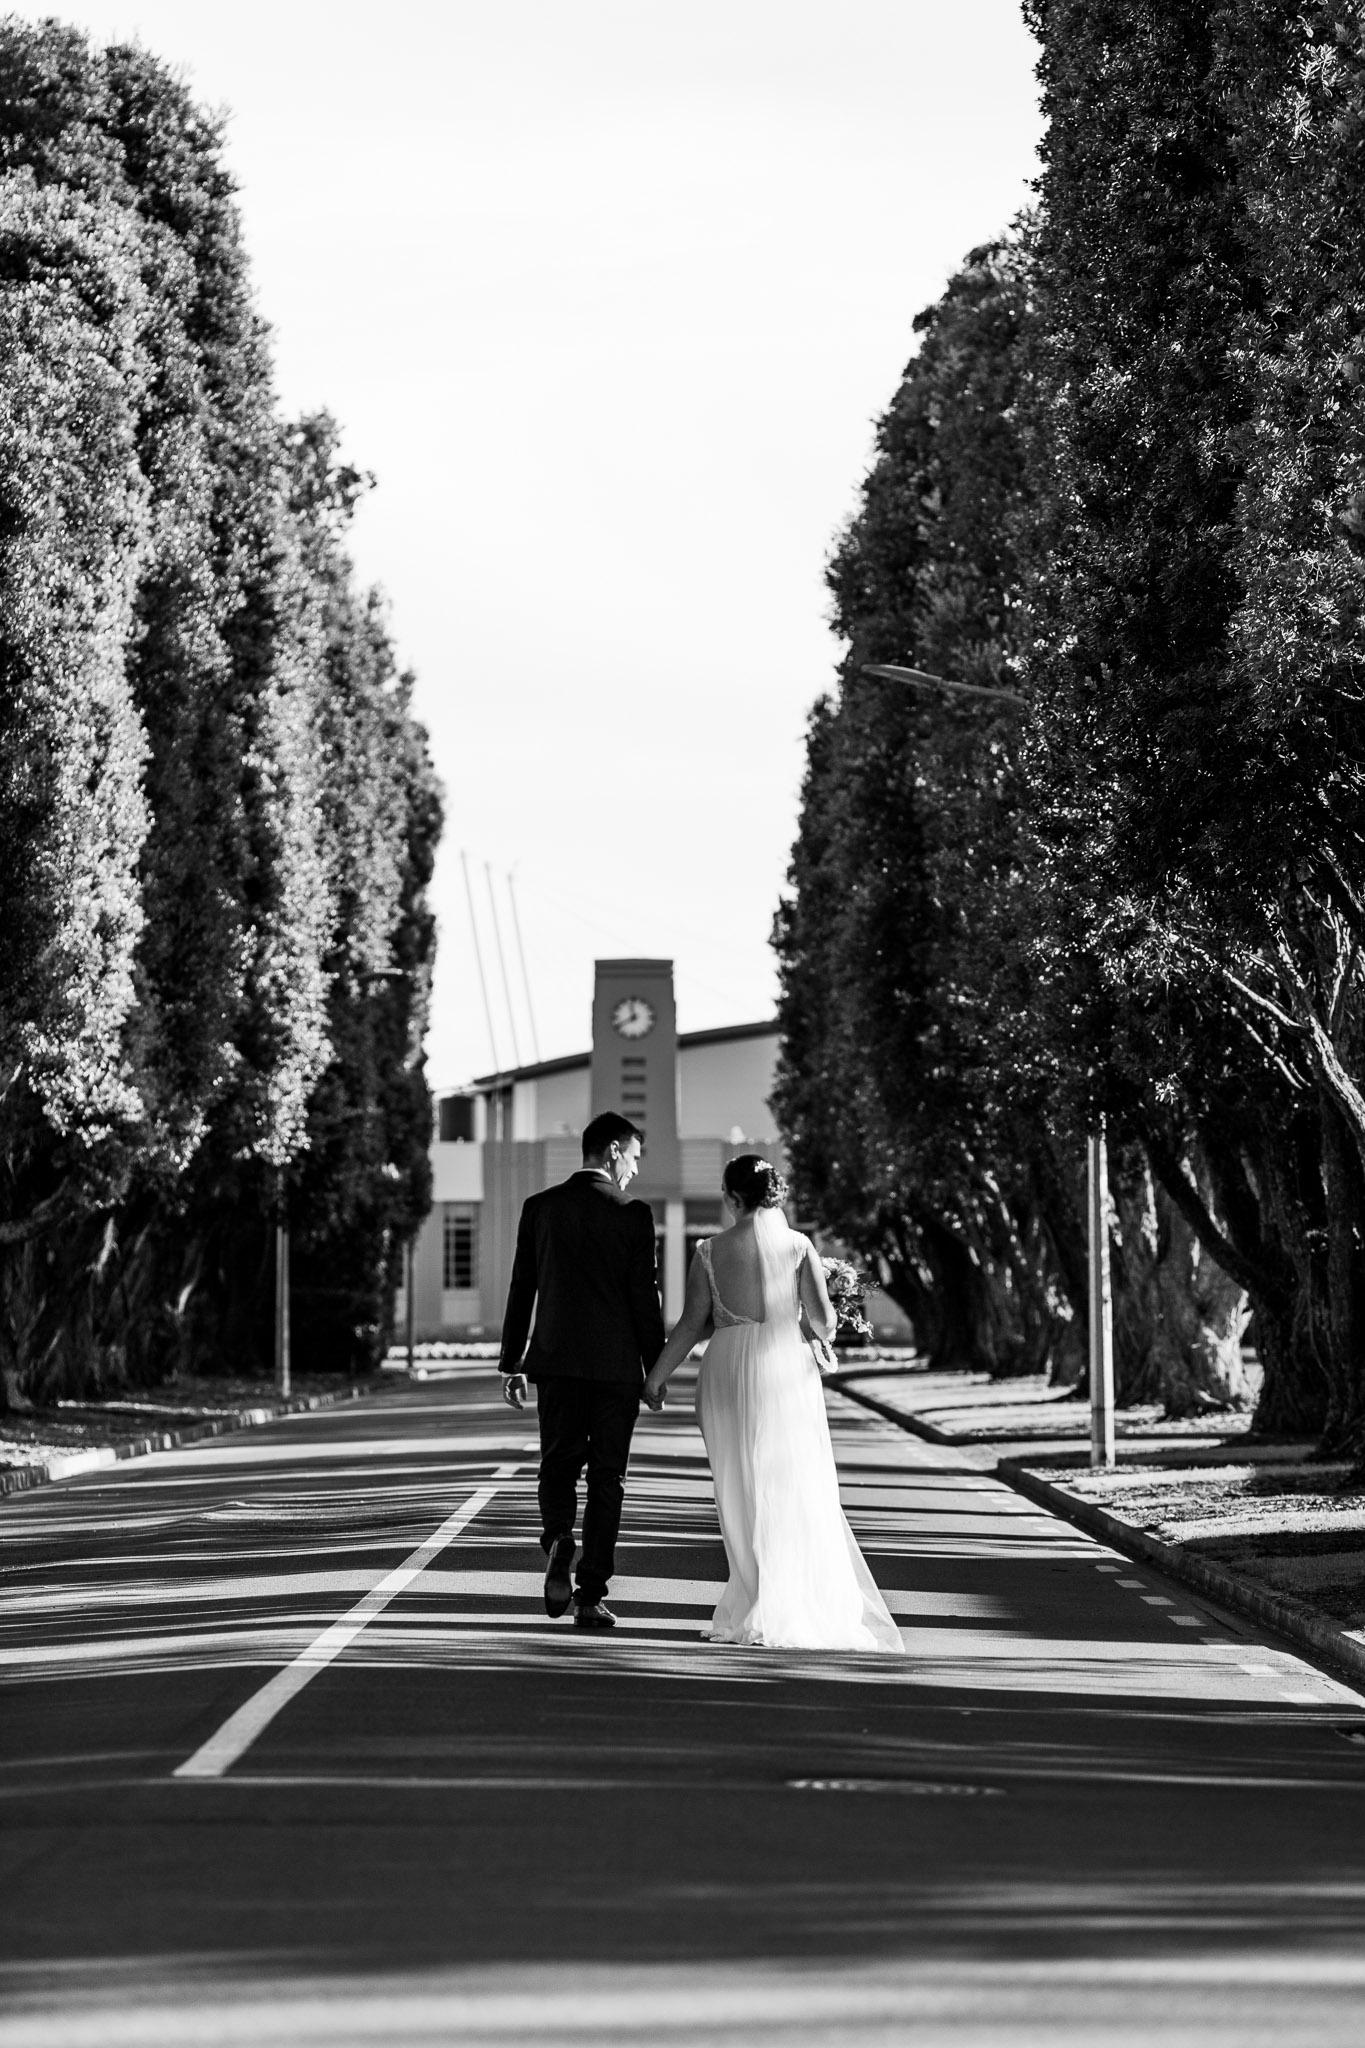 highlight_wedding_photography_manawatu_palmerston_north_new_zealand_rangitikei_golf_ohakea-33.jpg